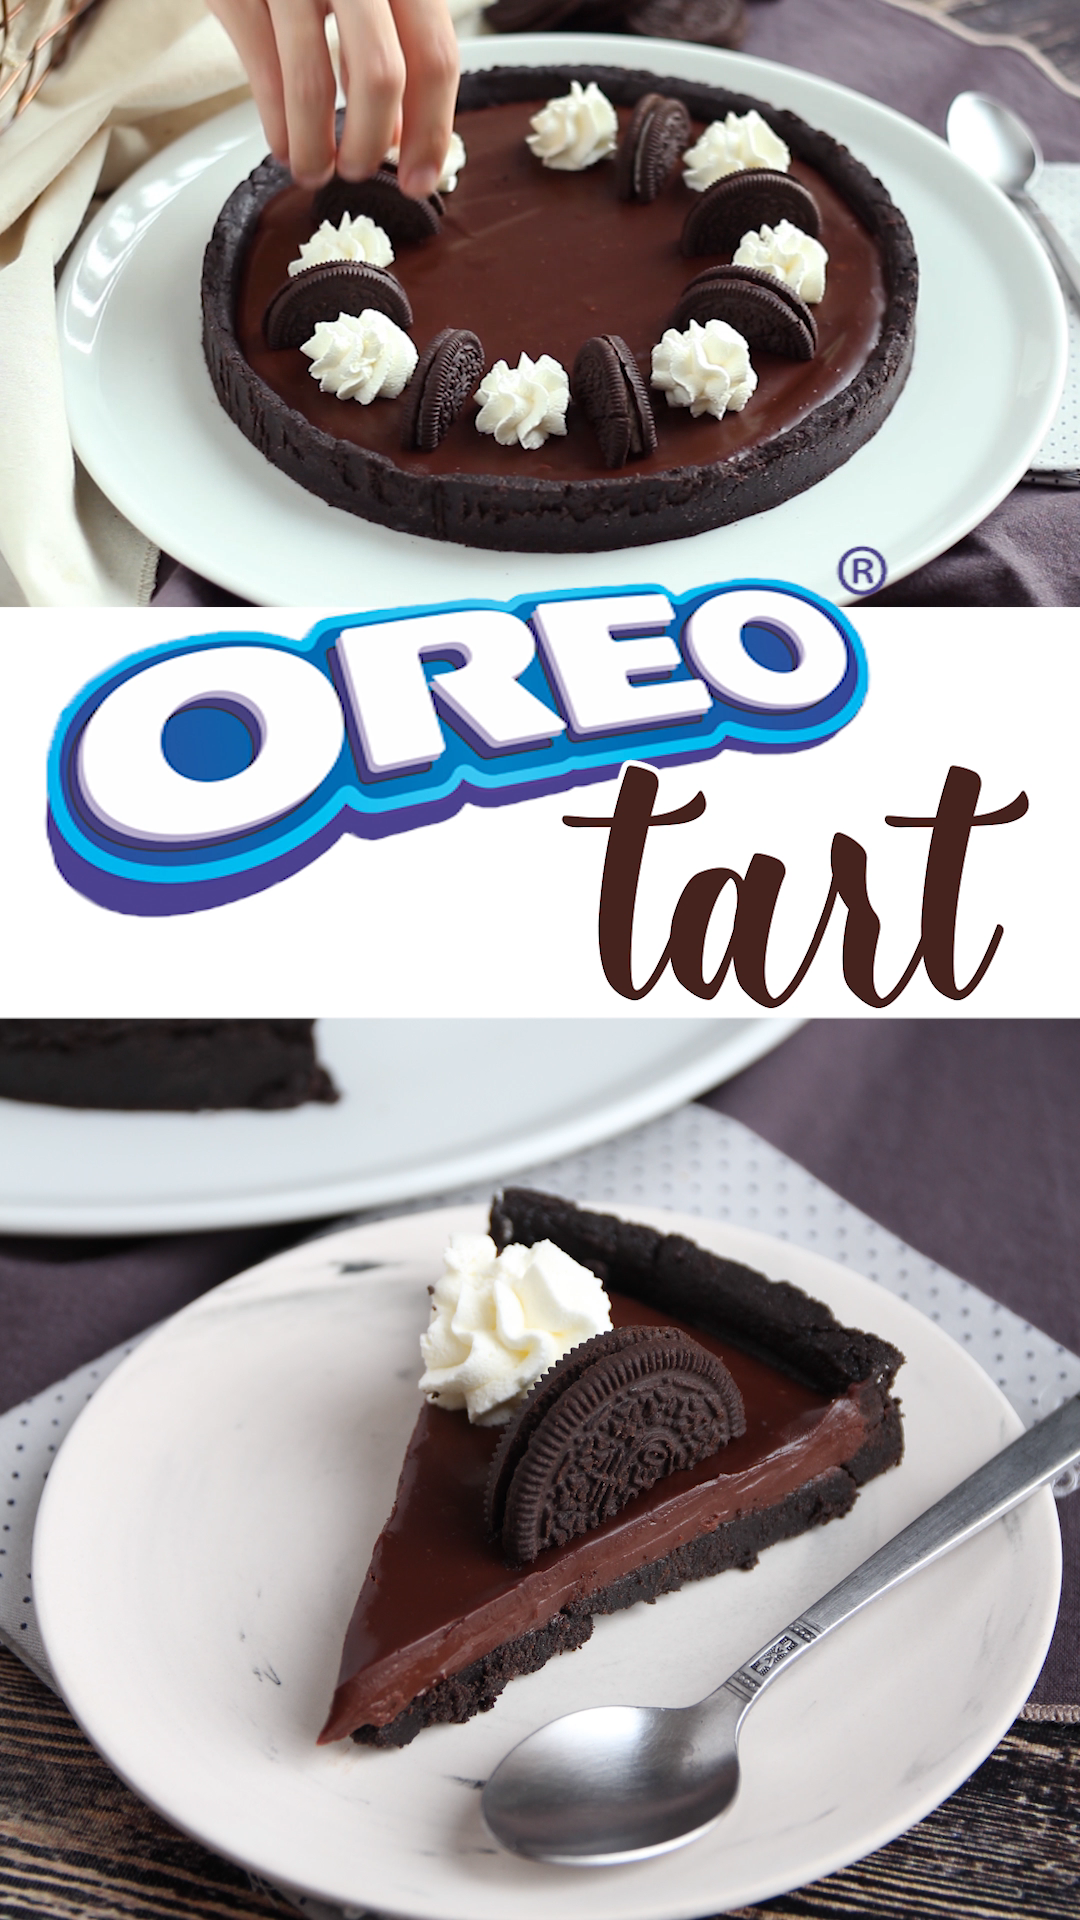 Oreo and chocolate tart - no bake